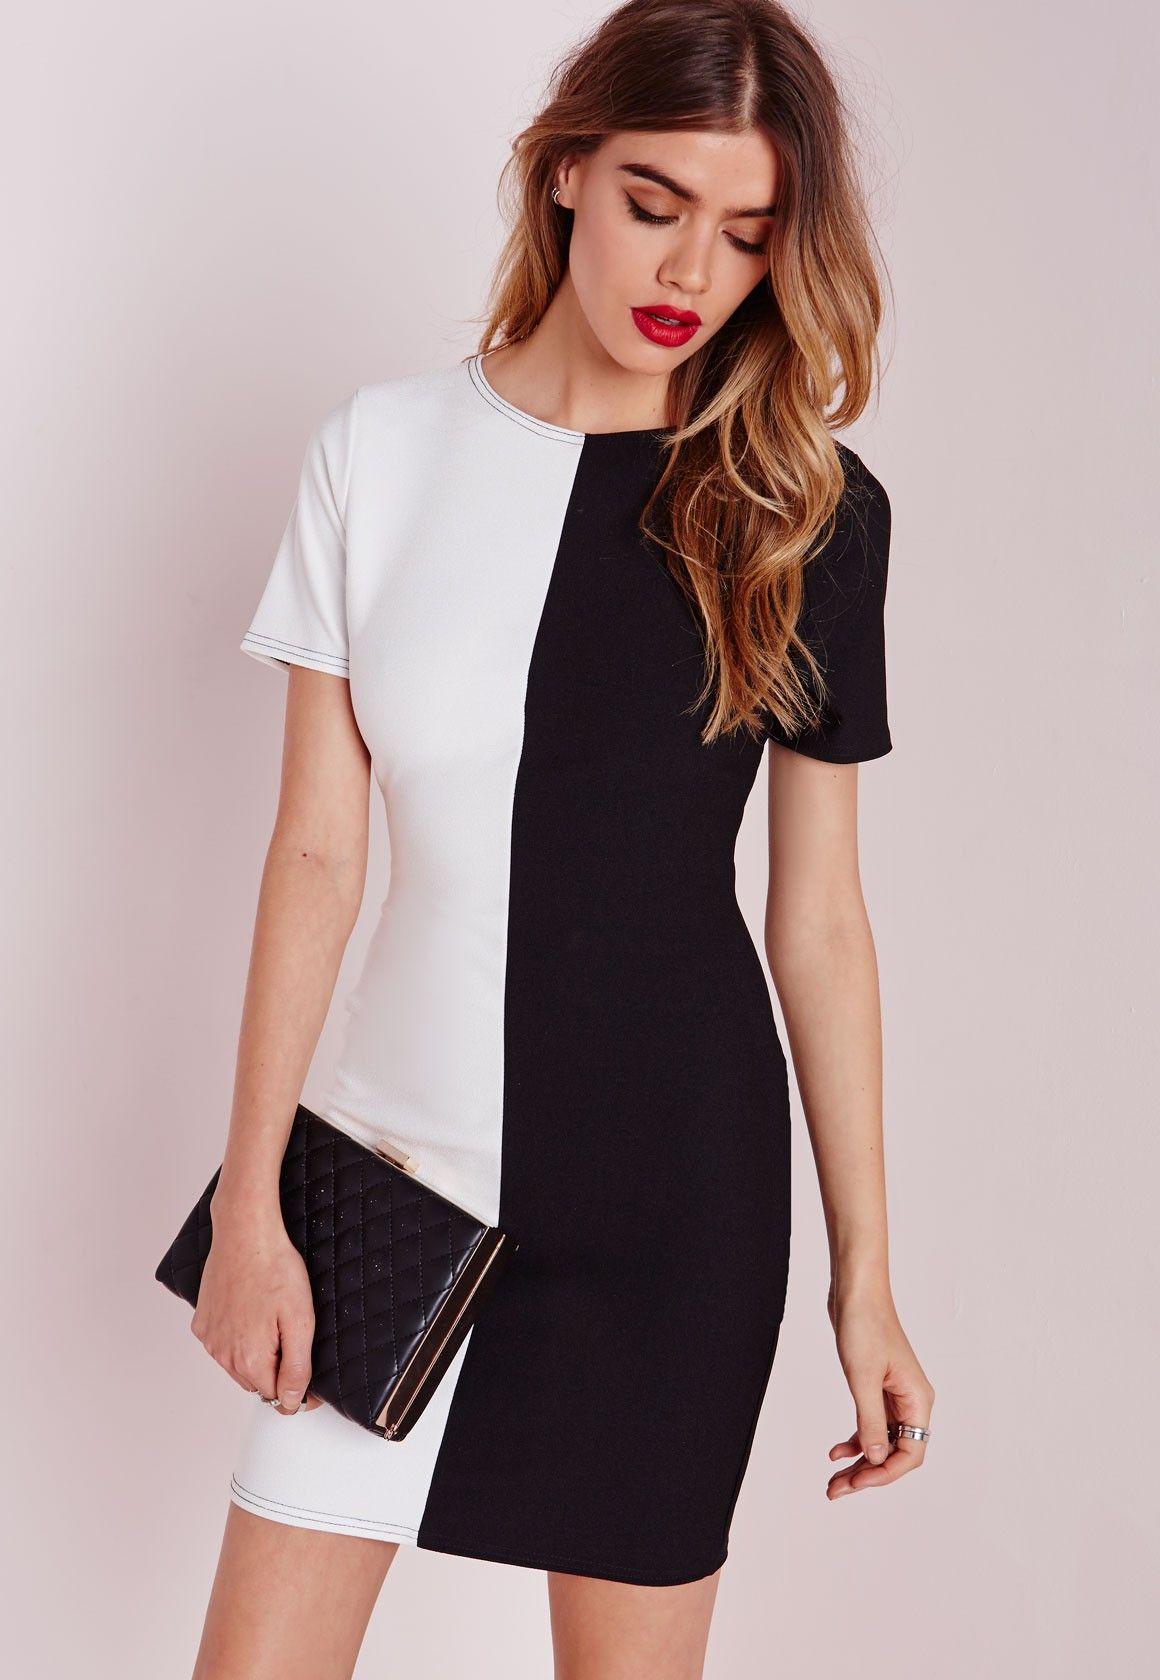 Monochrome Short Sleeve Bodycon Dress - Dresses - Bodycon Dresses - Missguided